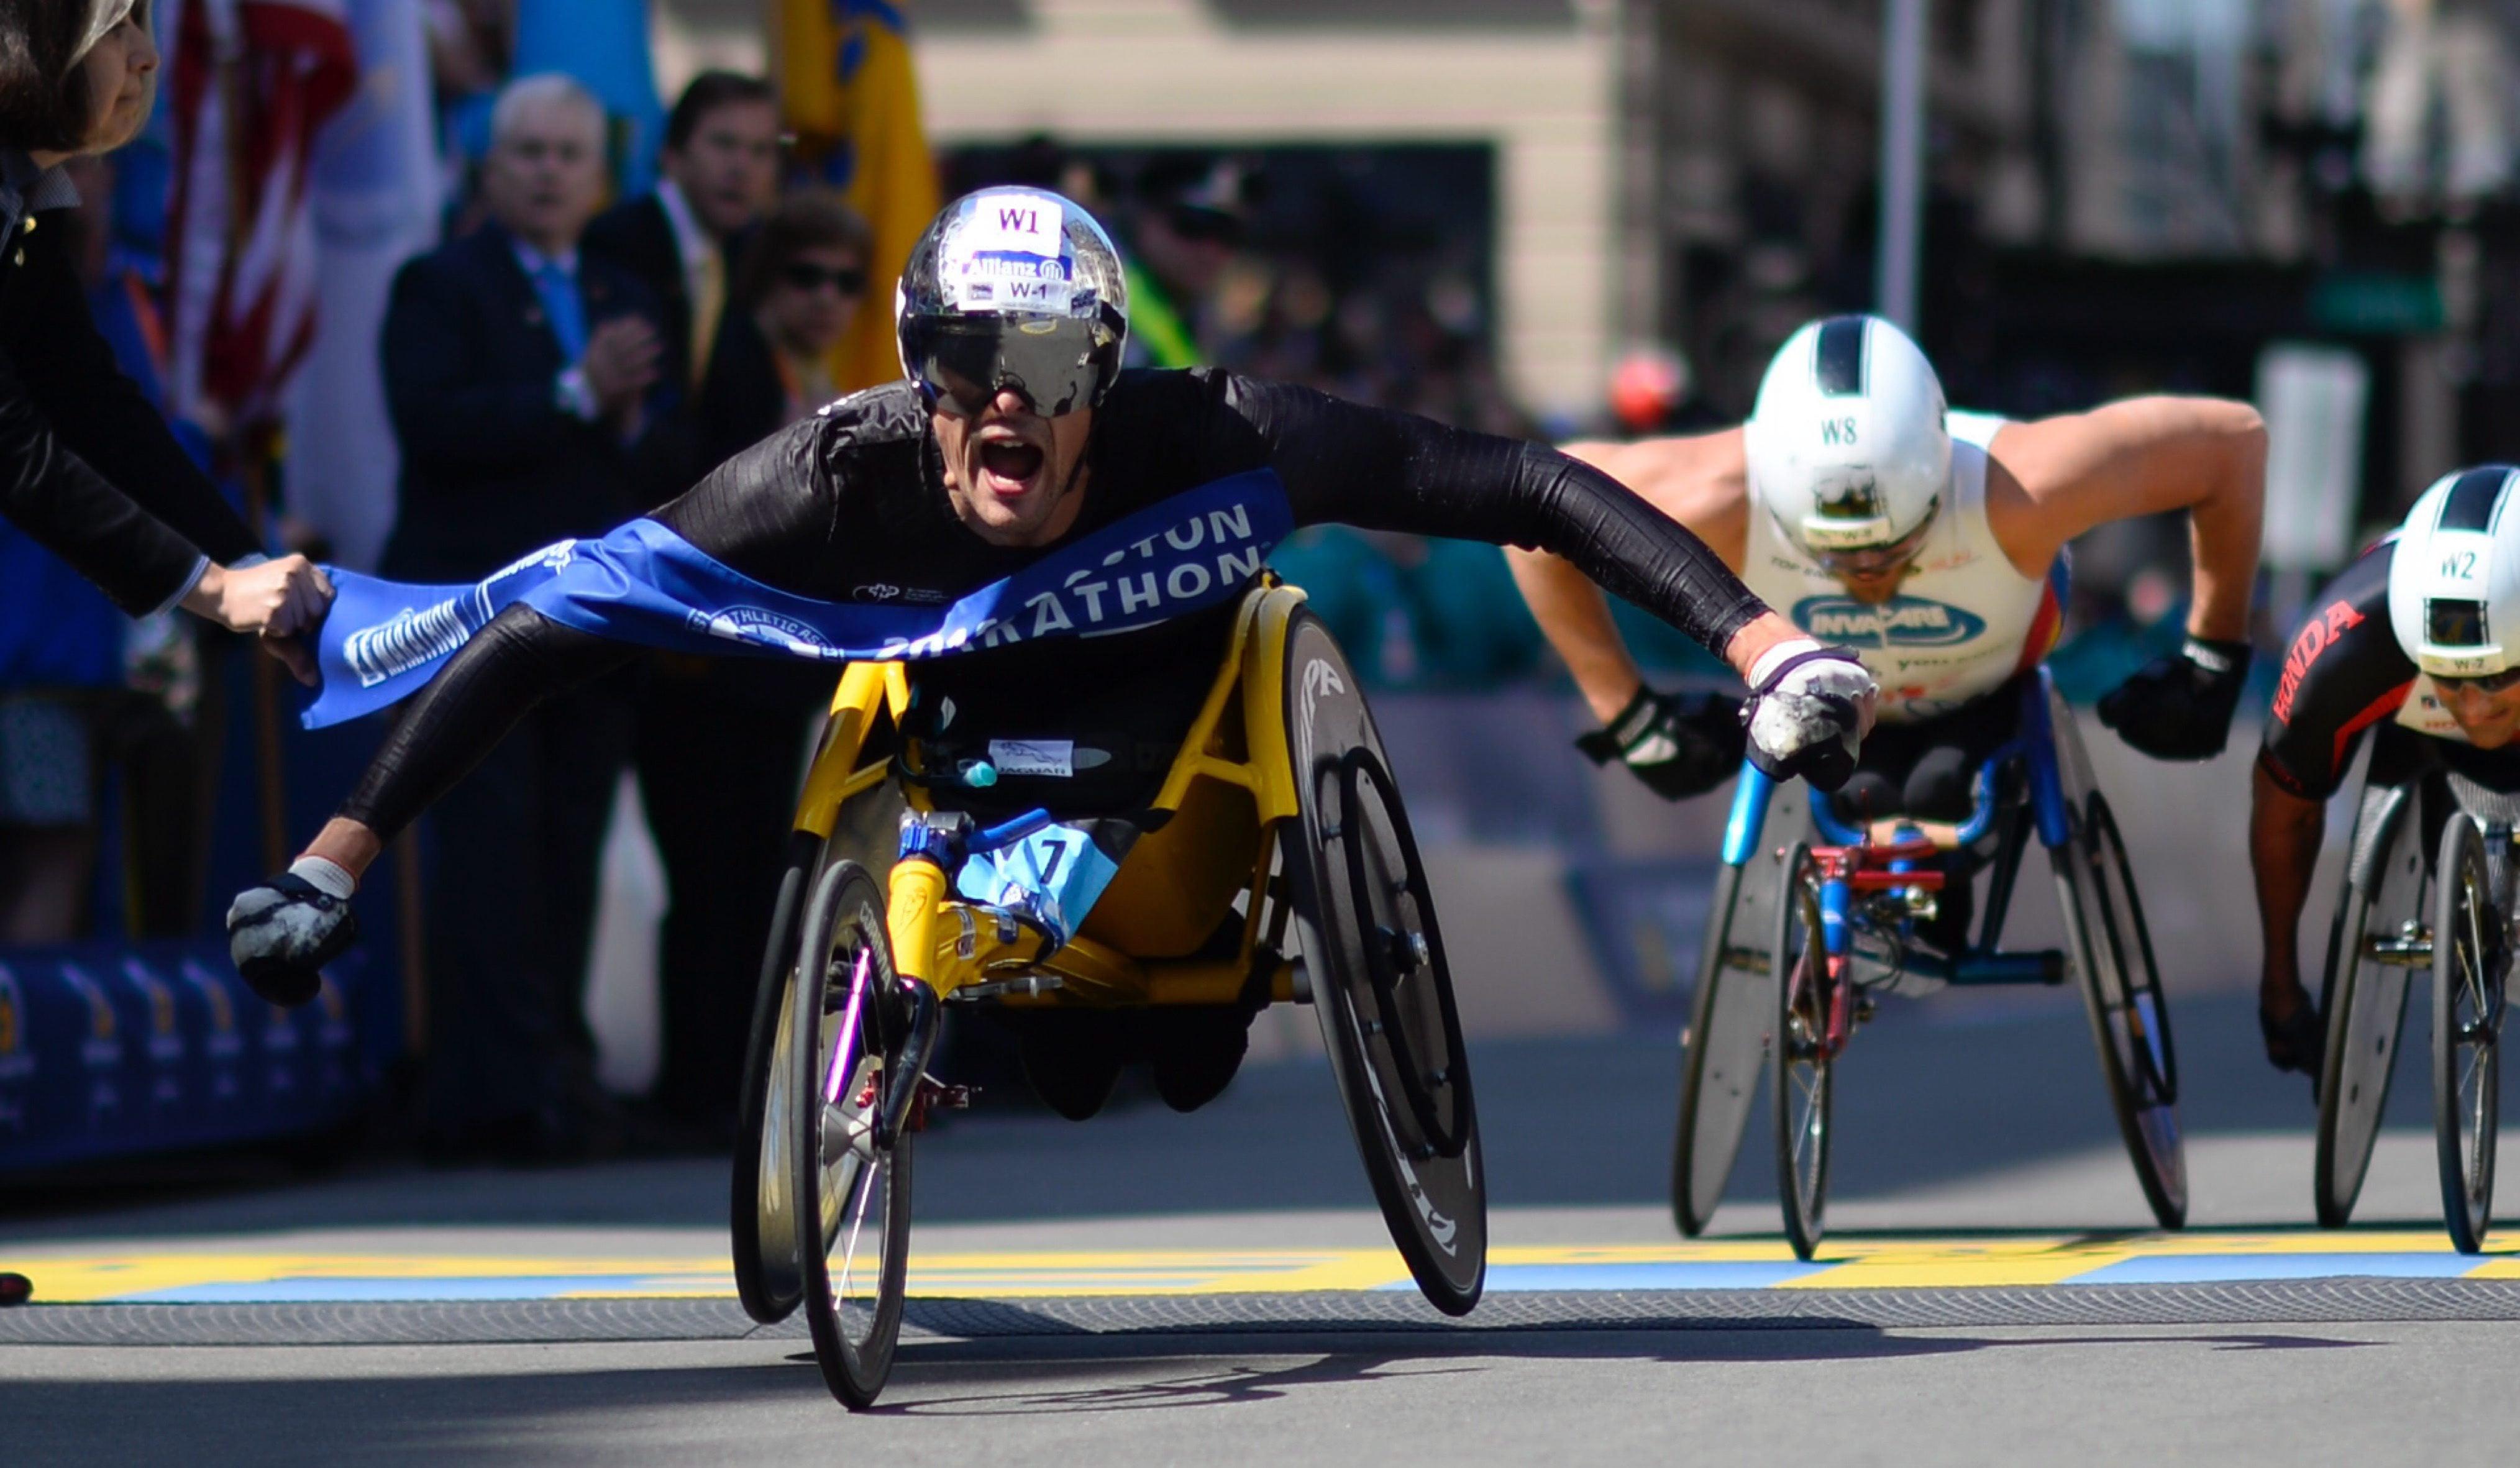 epa05265682 Marcel Hug of Switzerland (L) crosses the finish line to win the Men's Wheelchair division of the 120th Boston Marathon in Boston, Massachusetts, USA, 18 April 2016. EPA/CJ GUNTHER